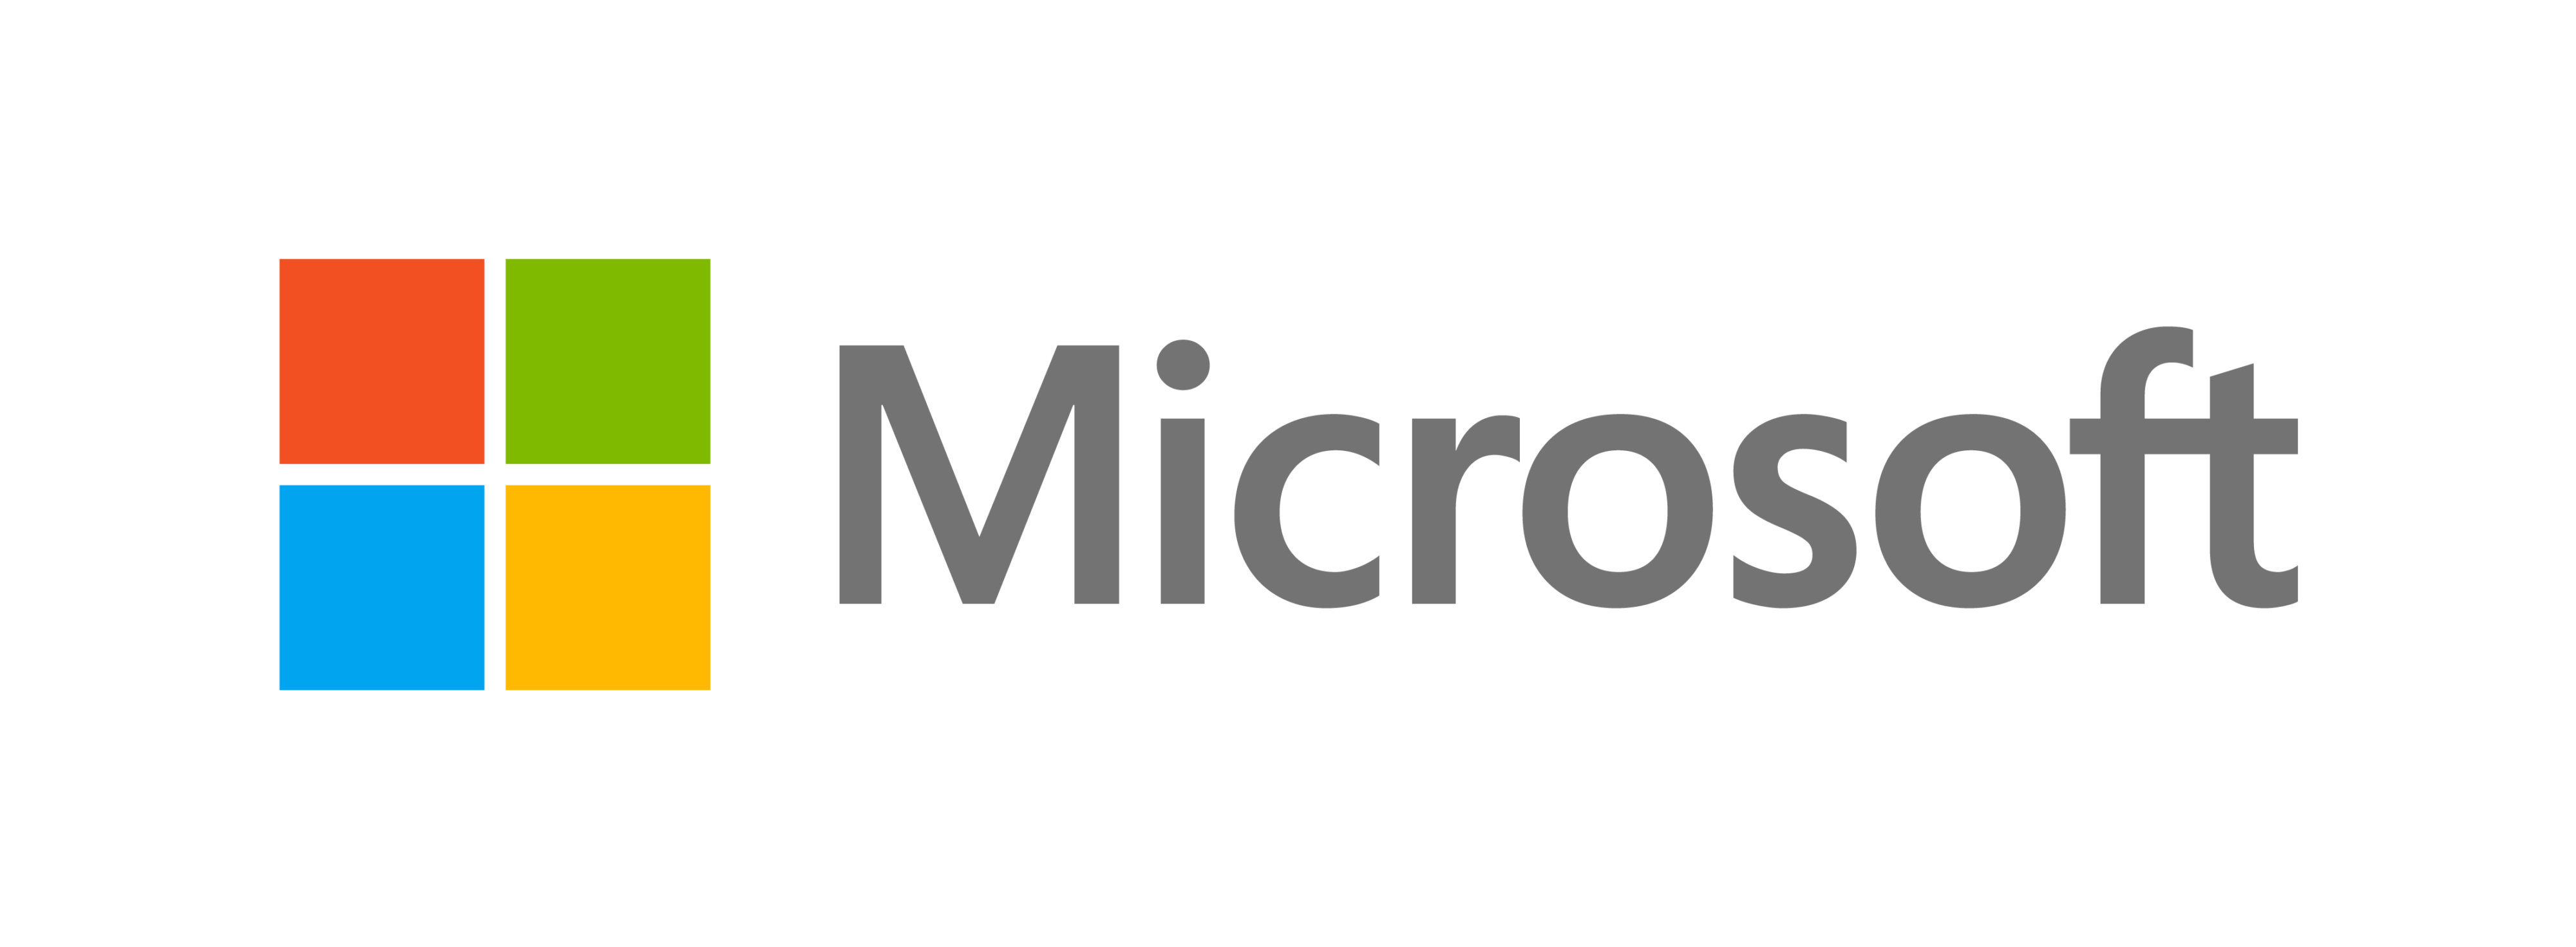 Microsoft Logo transperent e